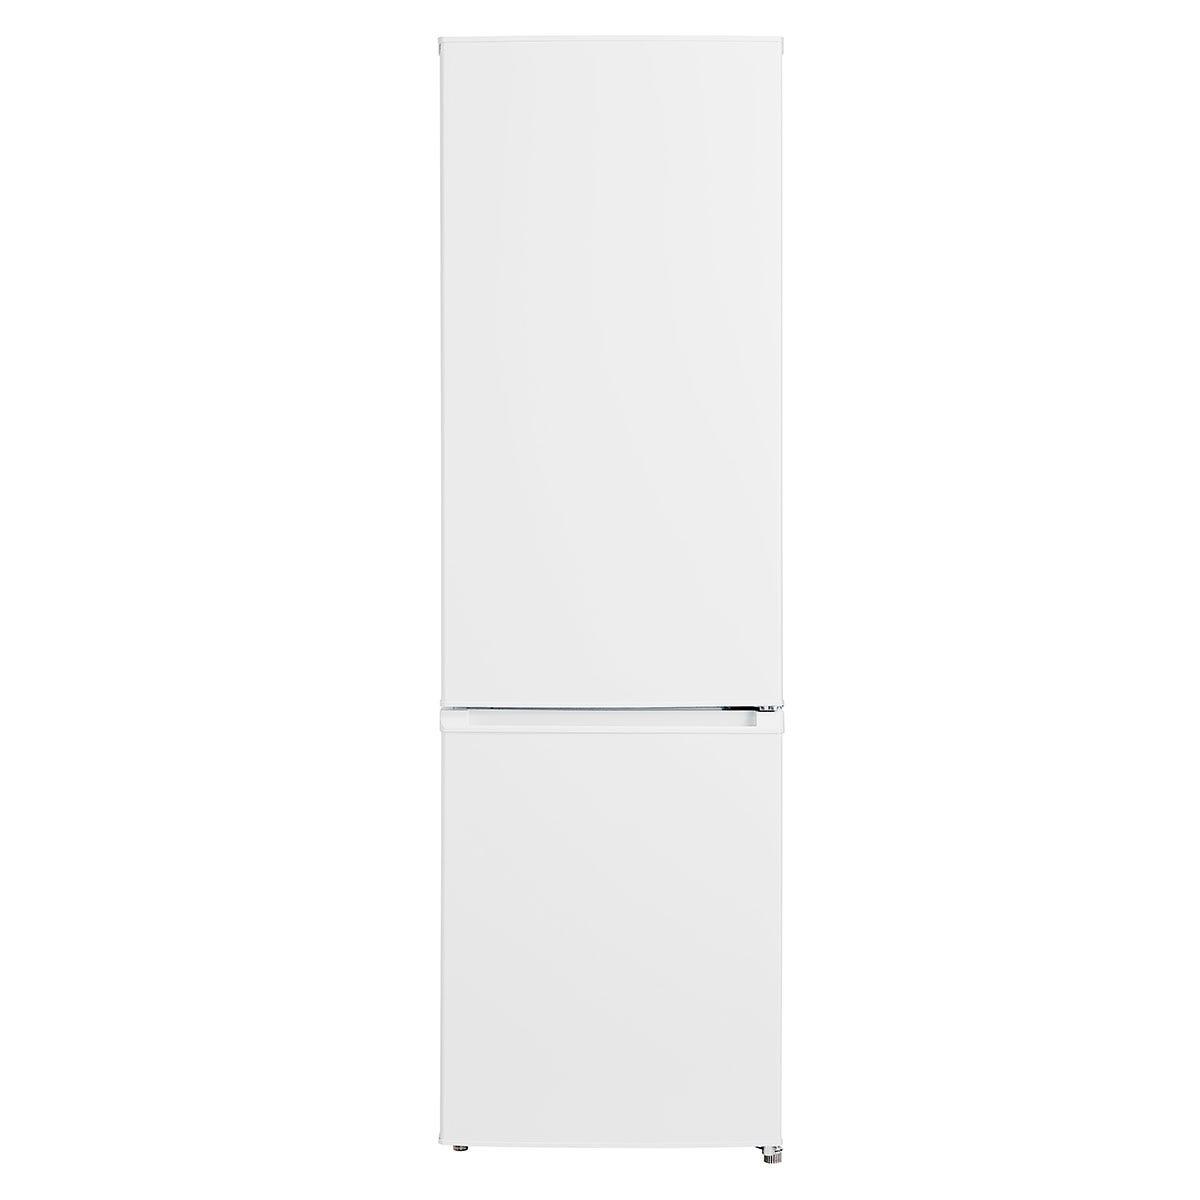 Haden HK346W 55cm 60:40 Split Fridge Freezer - White